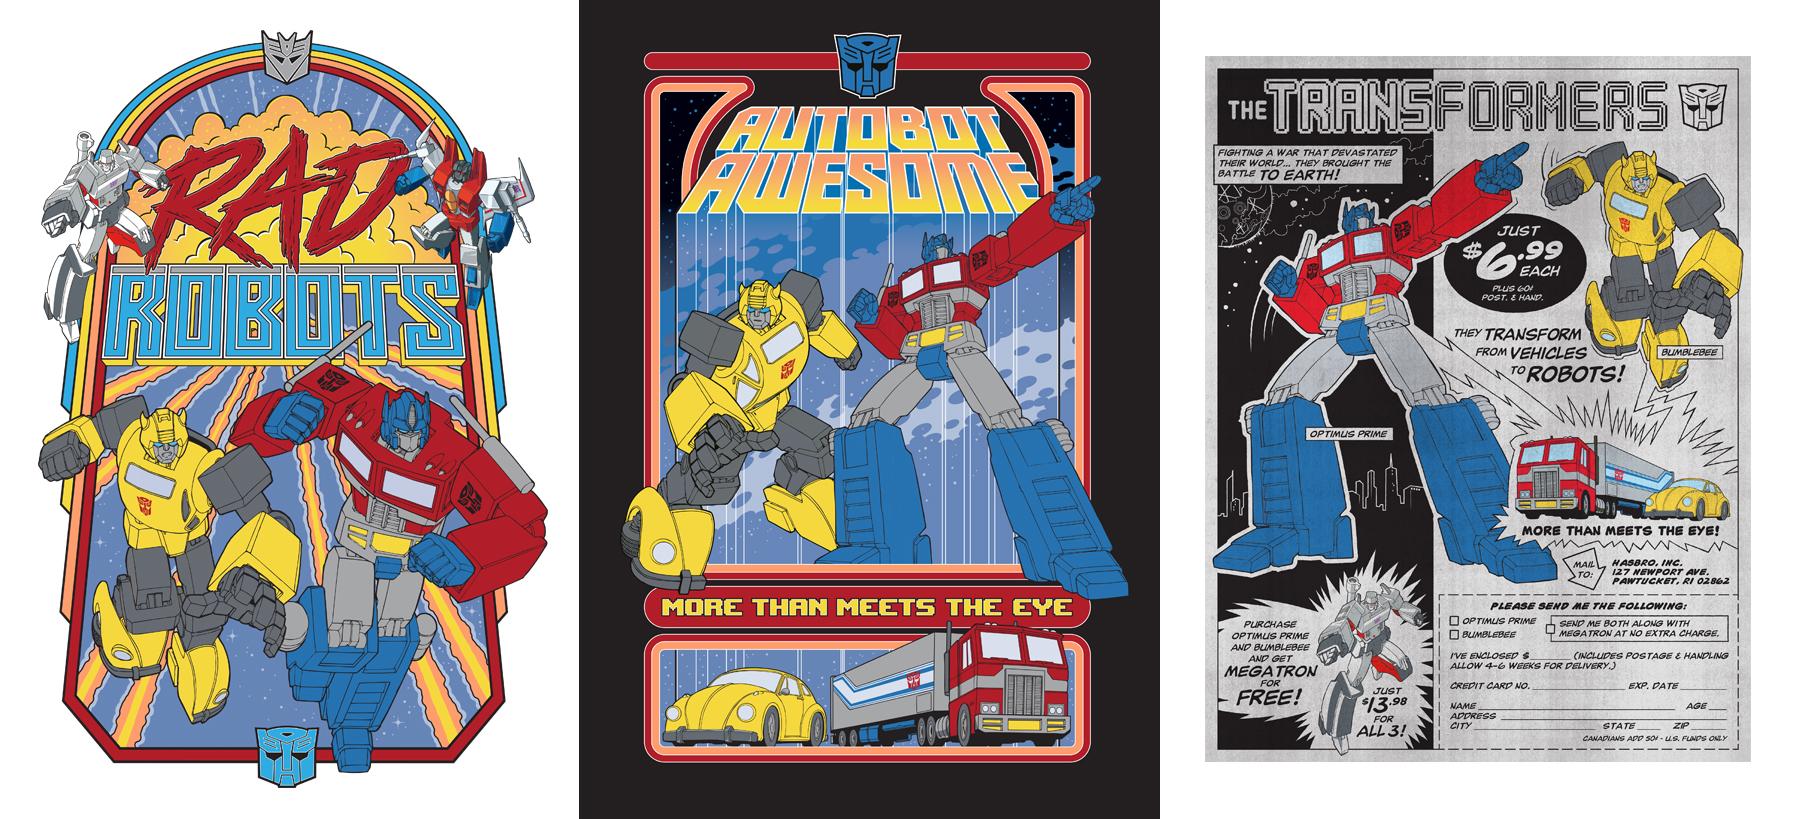 TF Gen 1: 1984 Arcade Style Guide Design - ID 3